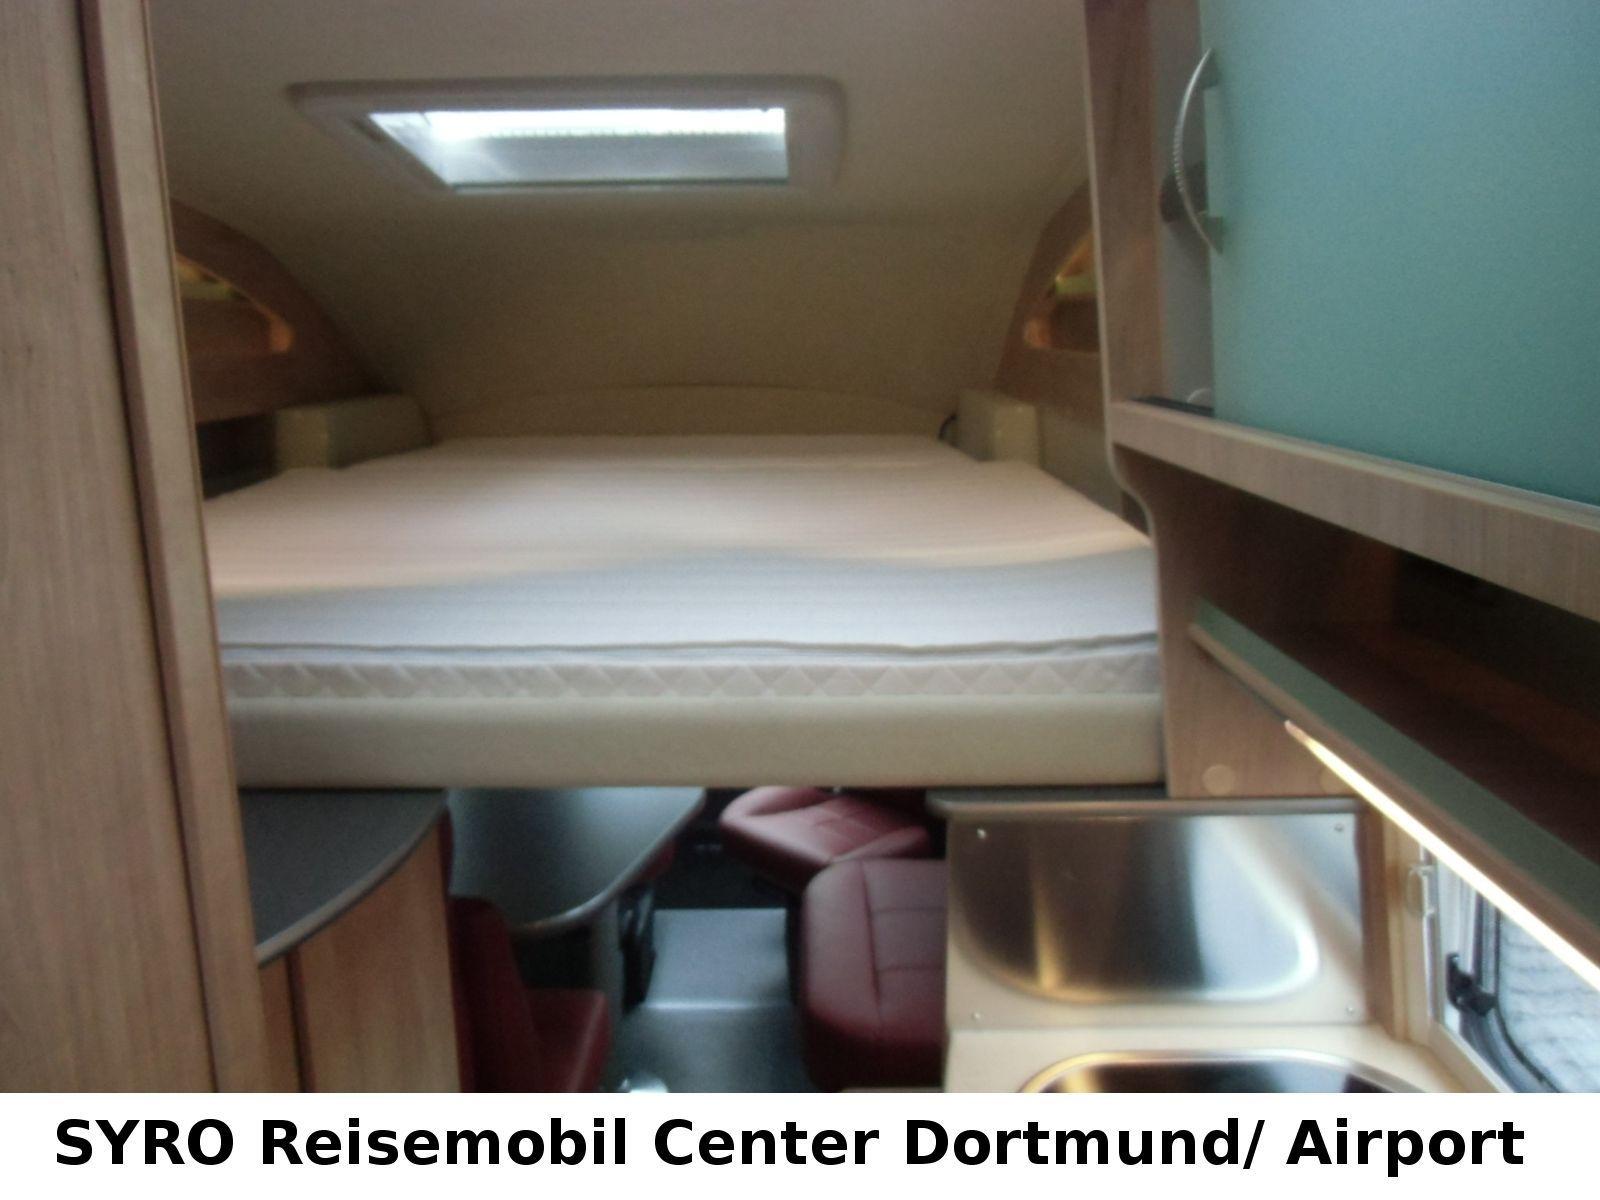 mercedes benz la strada nova m as part of integrated in holzwickede dortmund airport. Black Bedroom Furniture Sets. Home Design Ideas